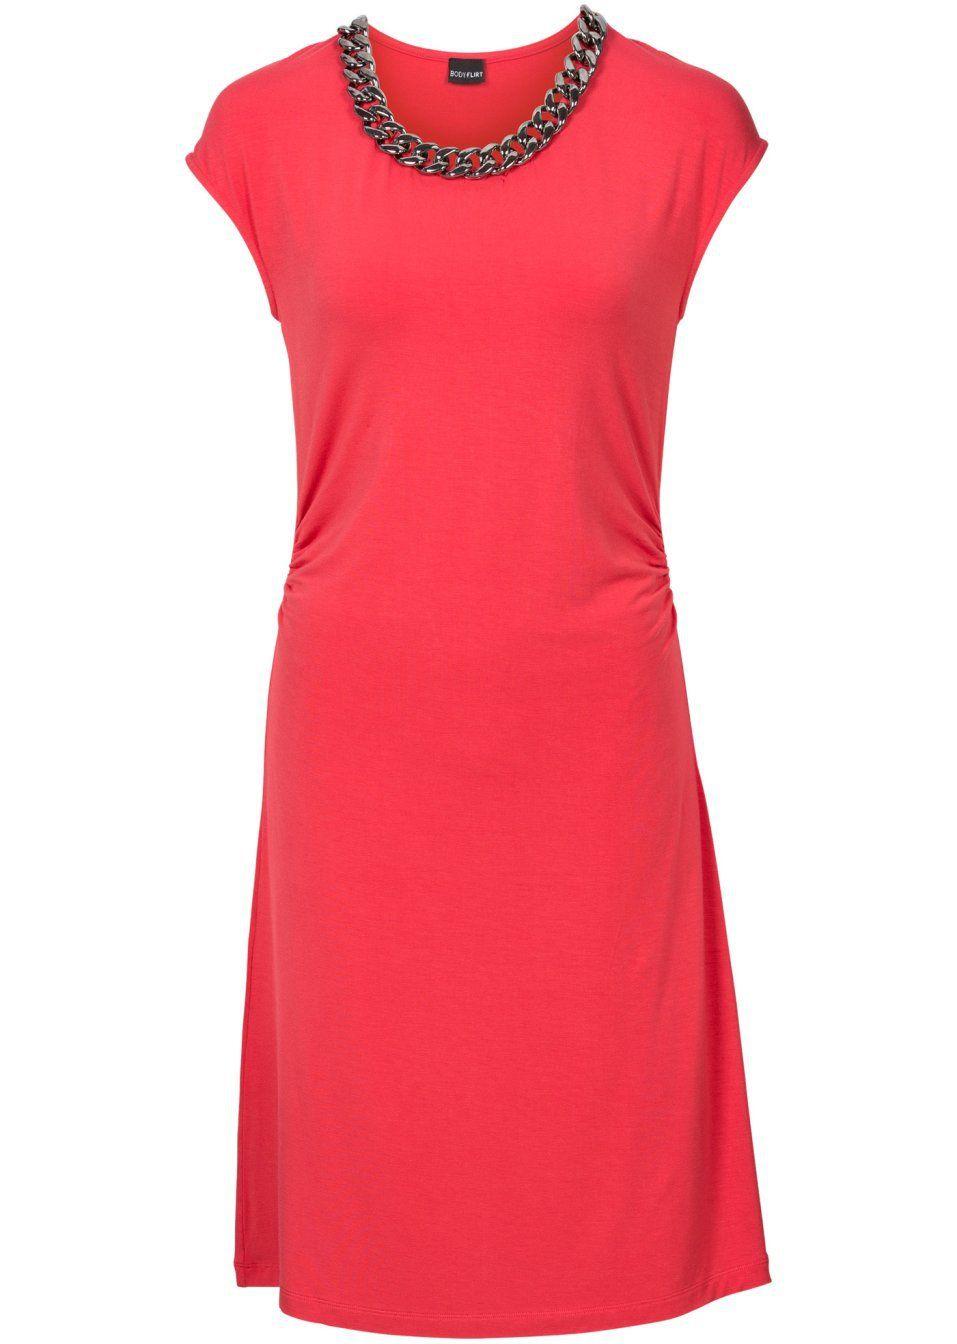 Šaty s retiazkou Výrazné šaty s • 17.99 € • bonprix  2470de79c01